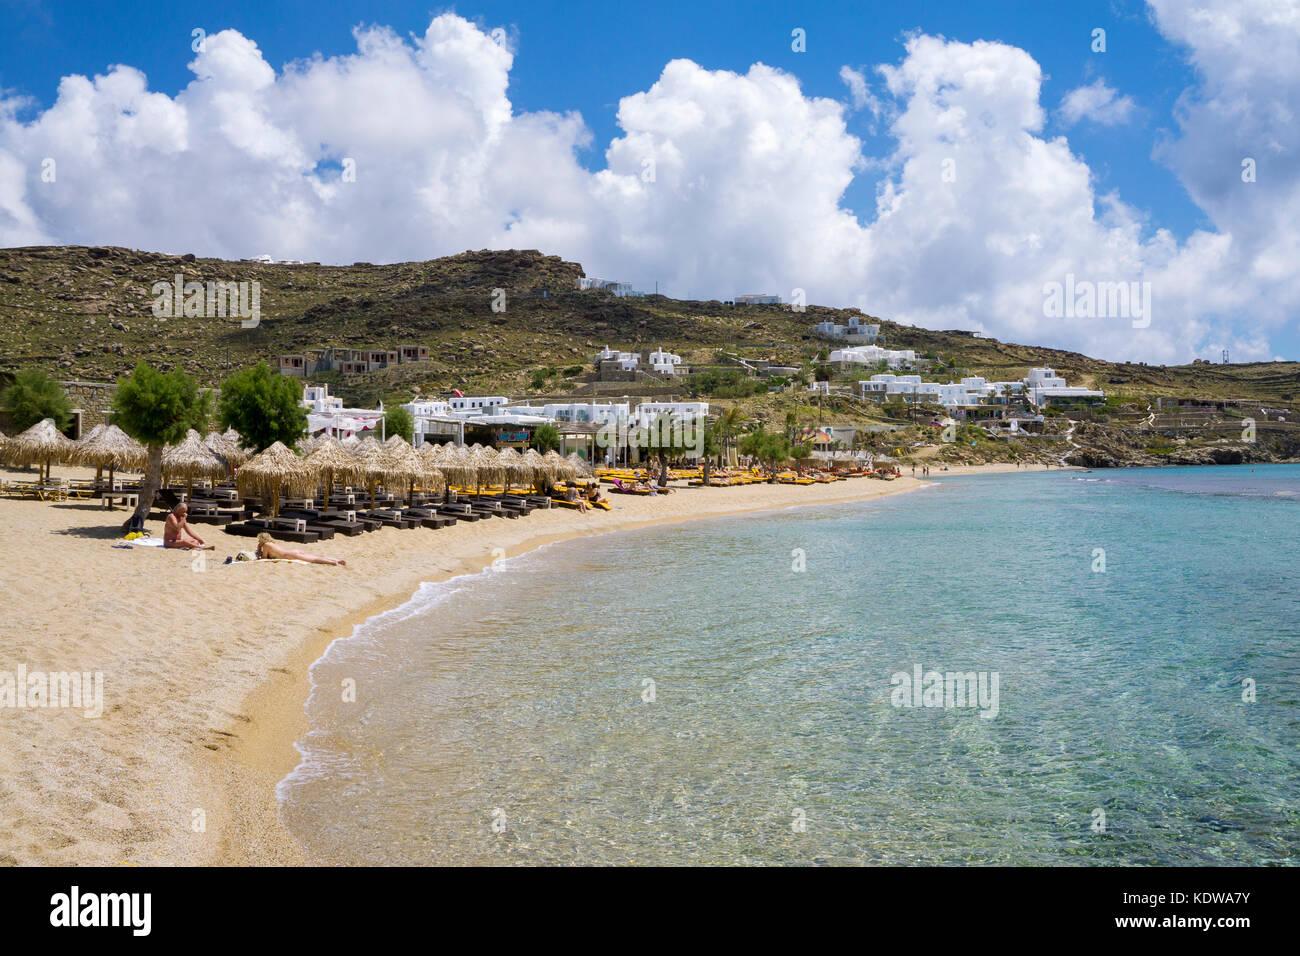 Paradise beach, popular beach at Mykonos, - Stock Image